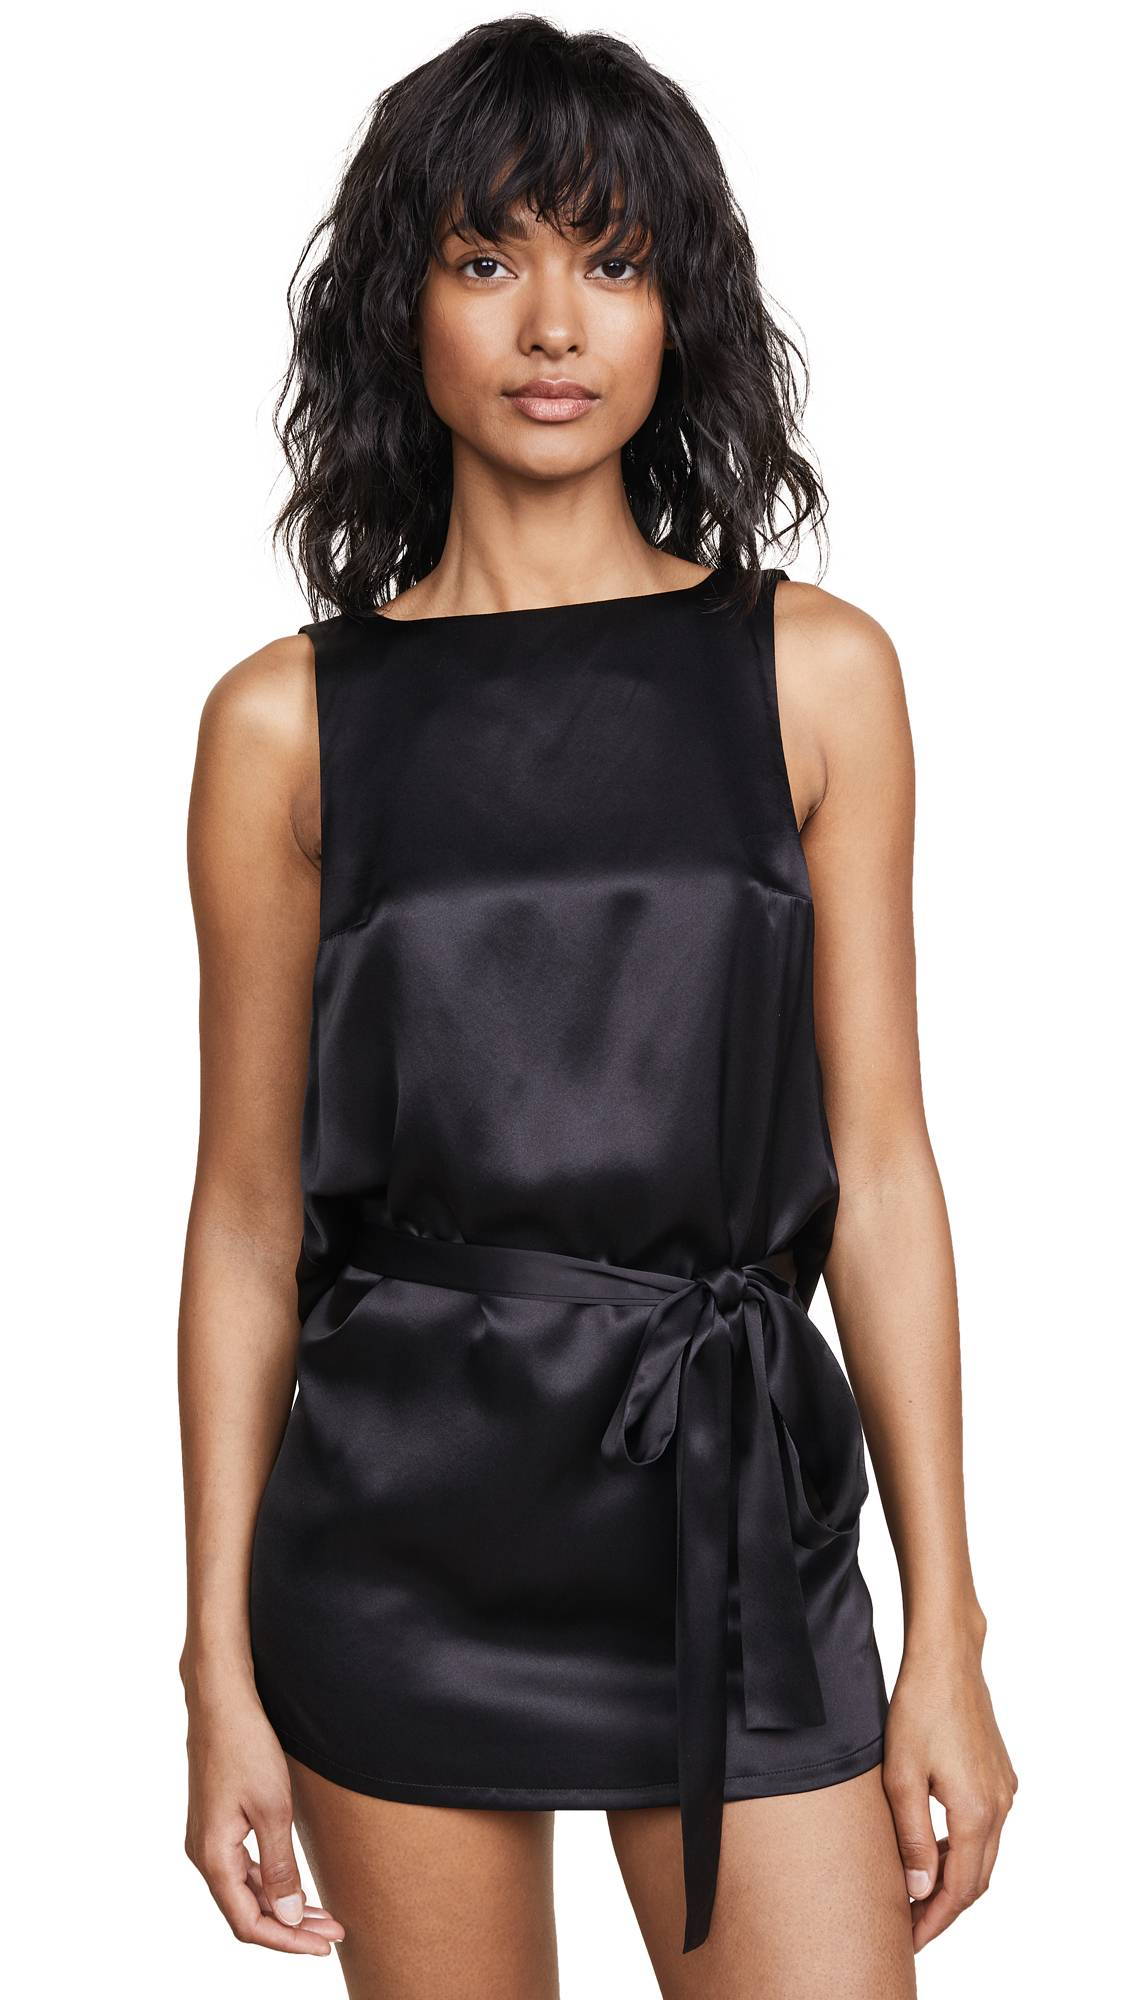 Kiki De Montparnasse Welcome Home Tunic  - Black - Size: Small